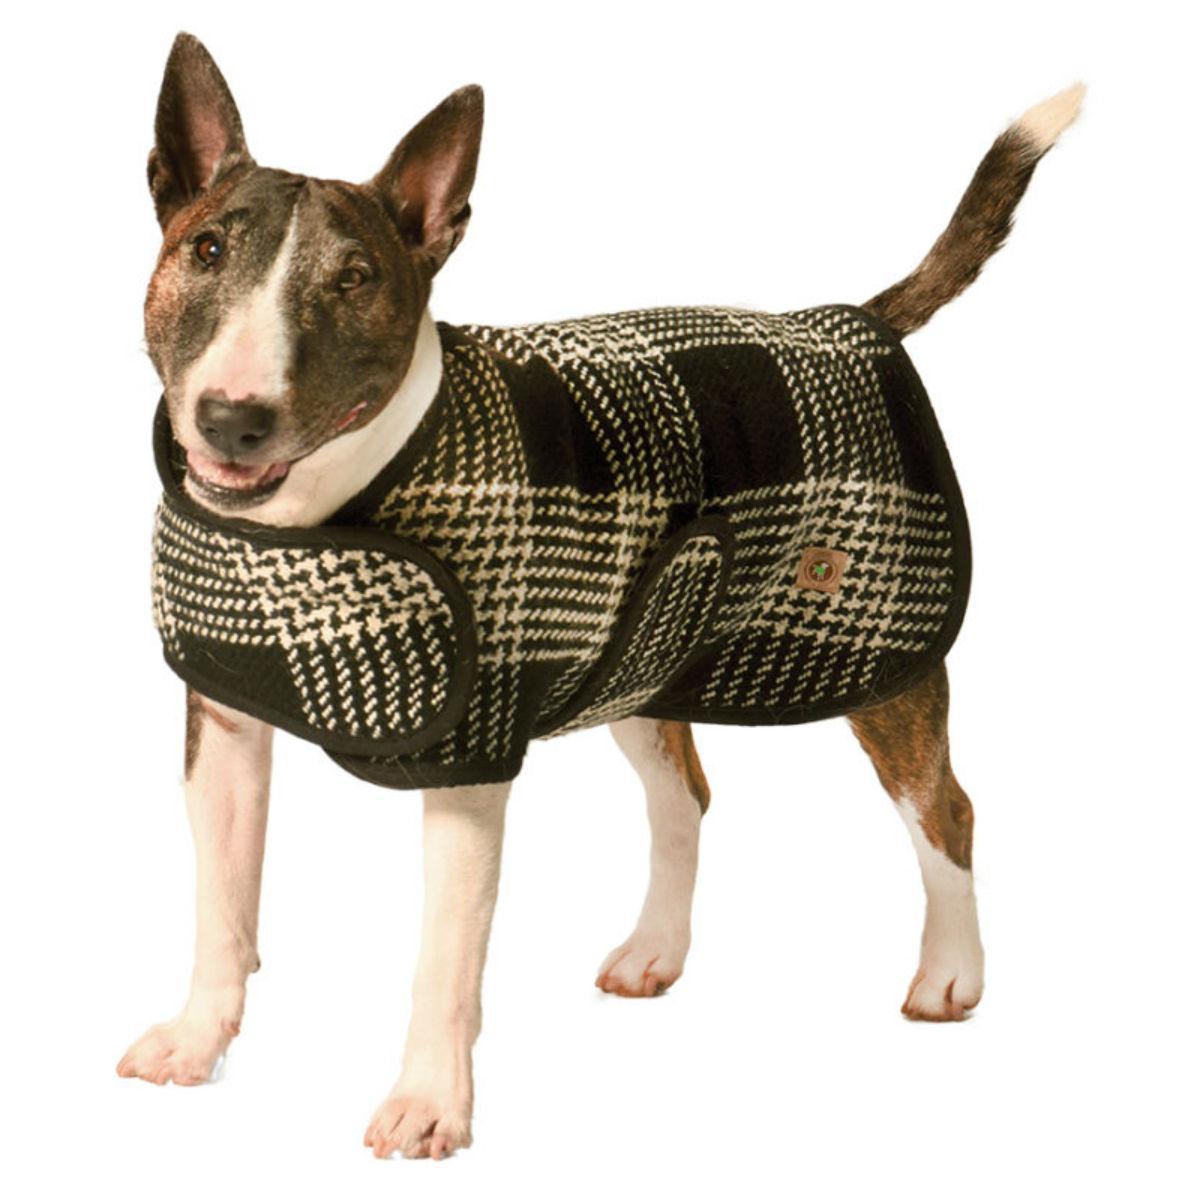 Chilly Dog Plaid Blanket Dog Coat - Black and White